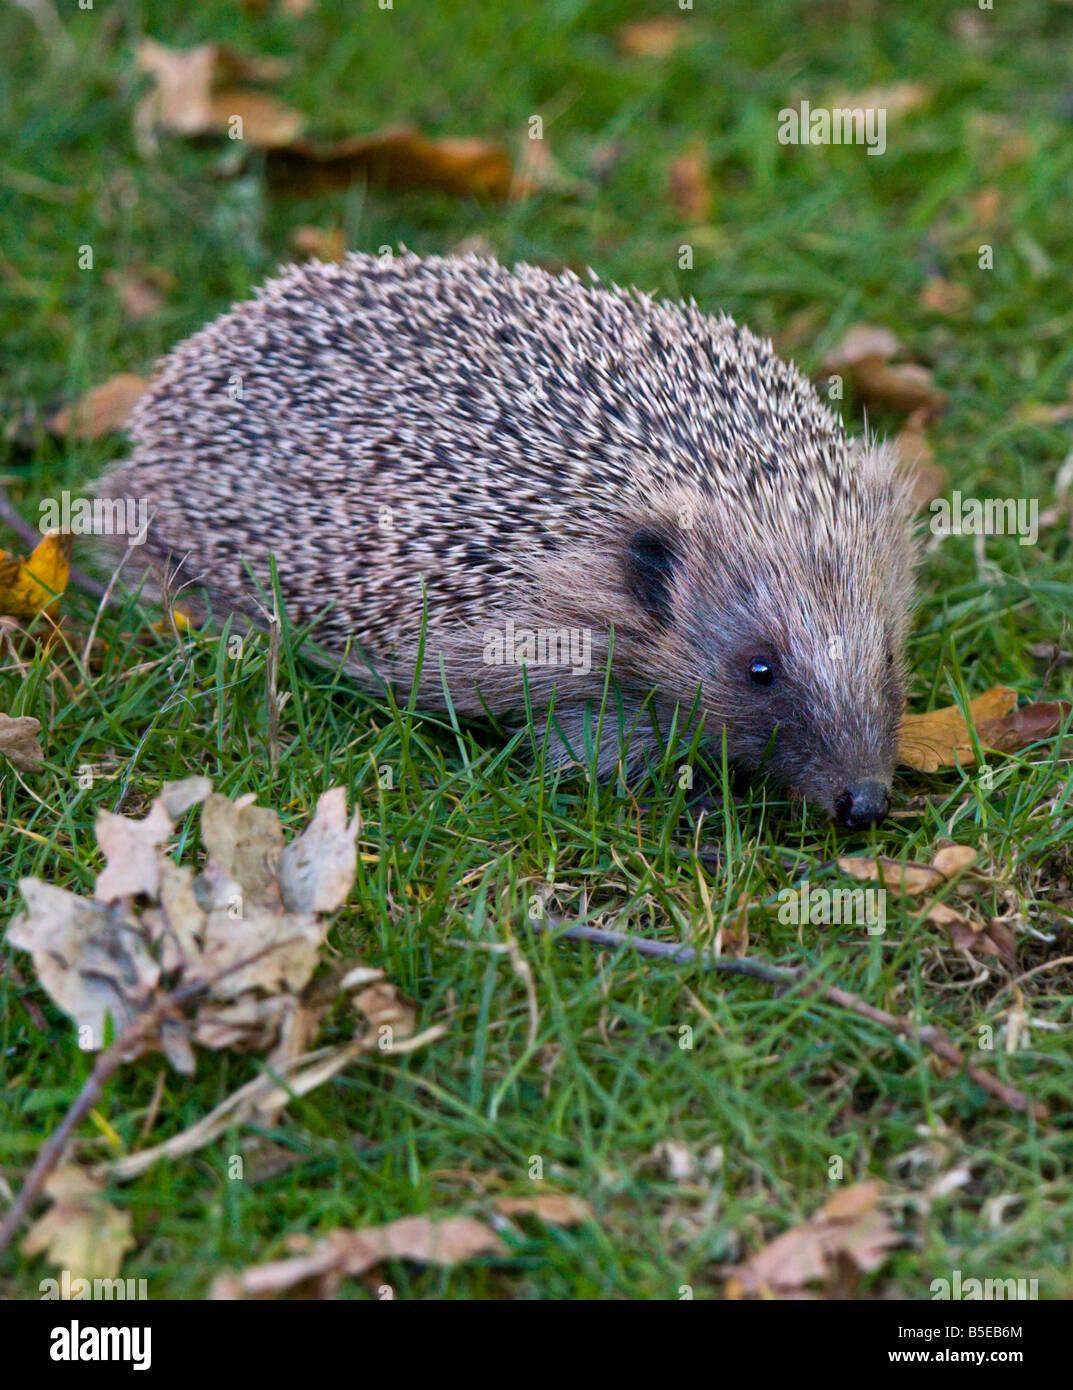 European Hedgehog (Erinaceus europaeus), UK - Stock Image